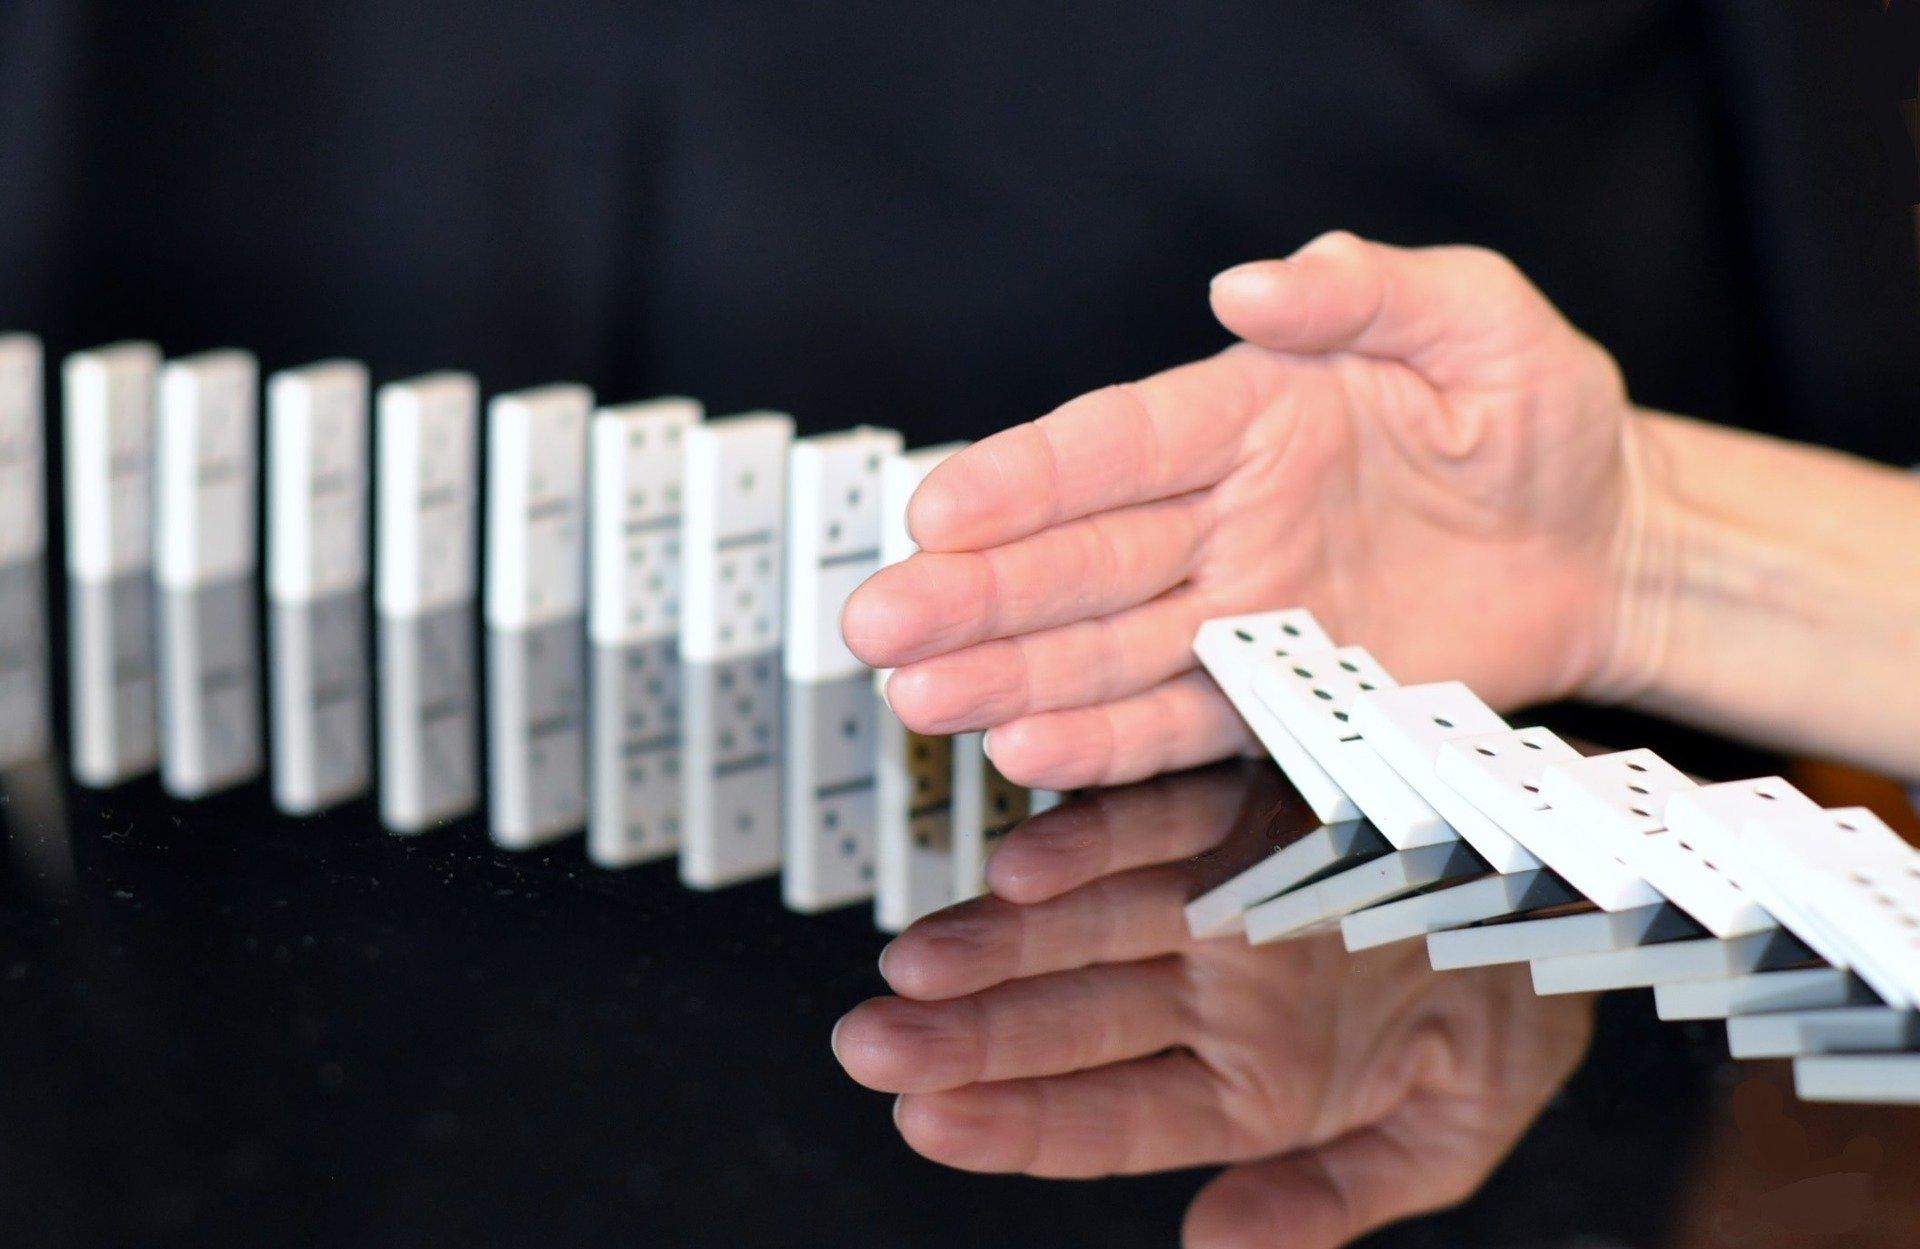 Un geste barrière interrompt l'effet domino